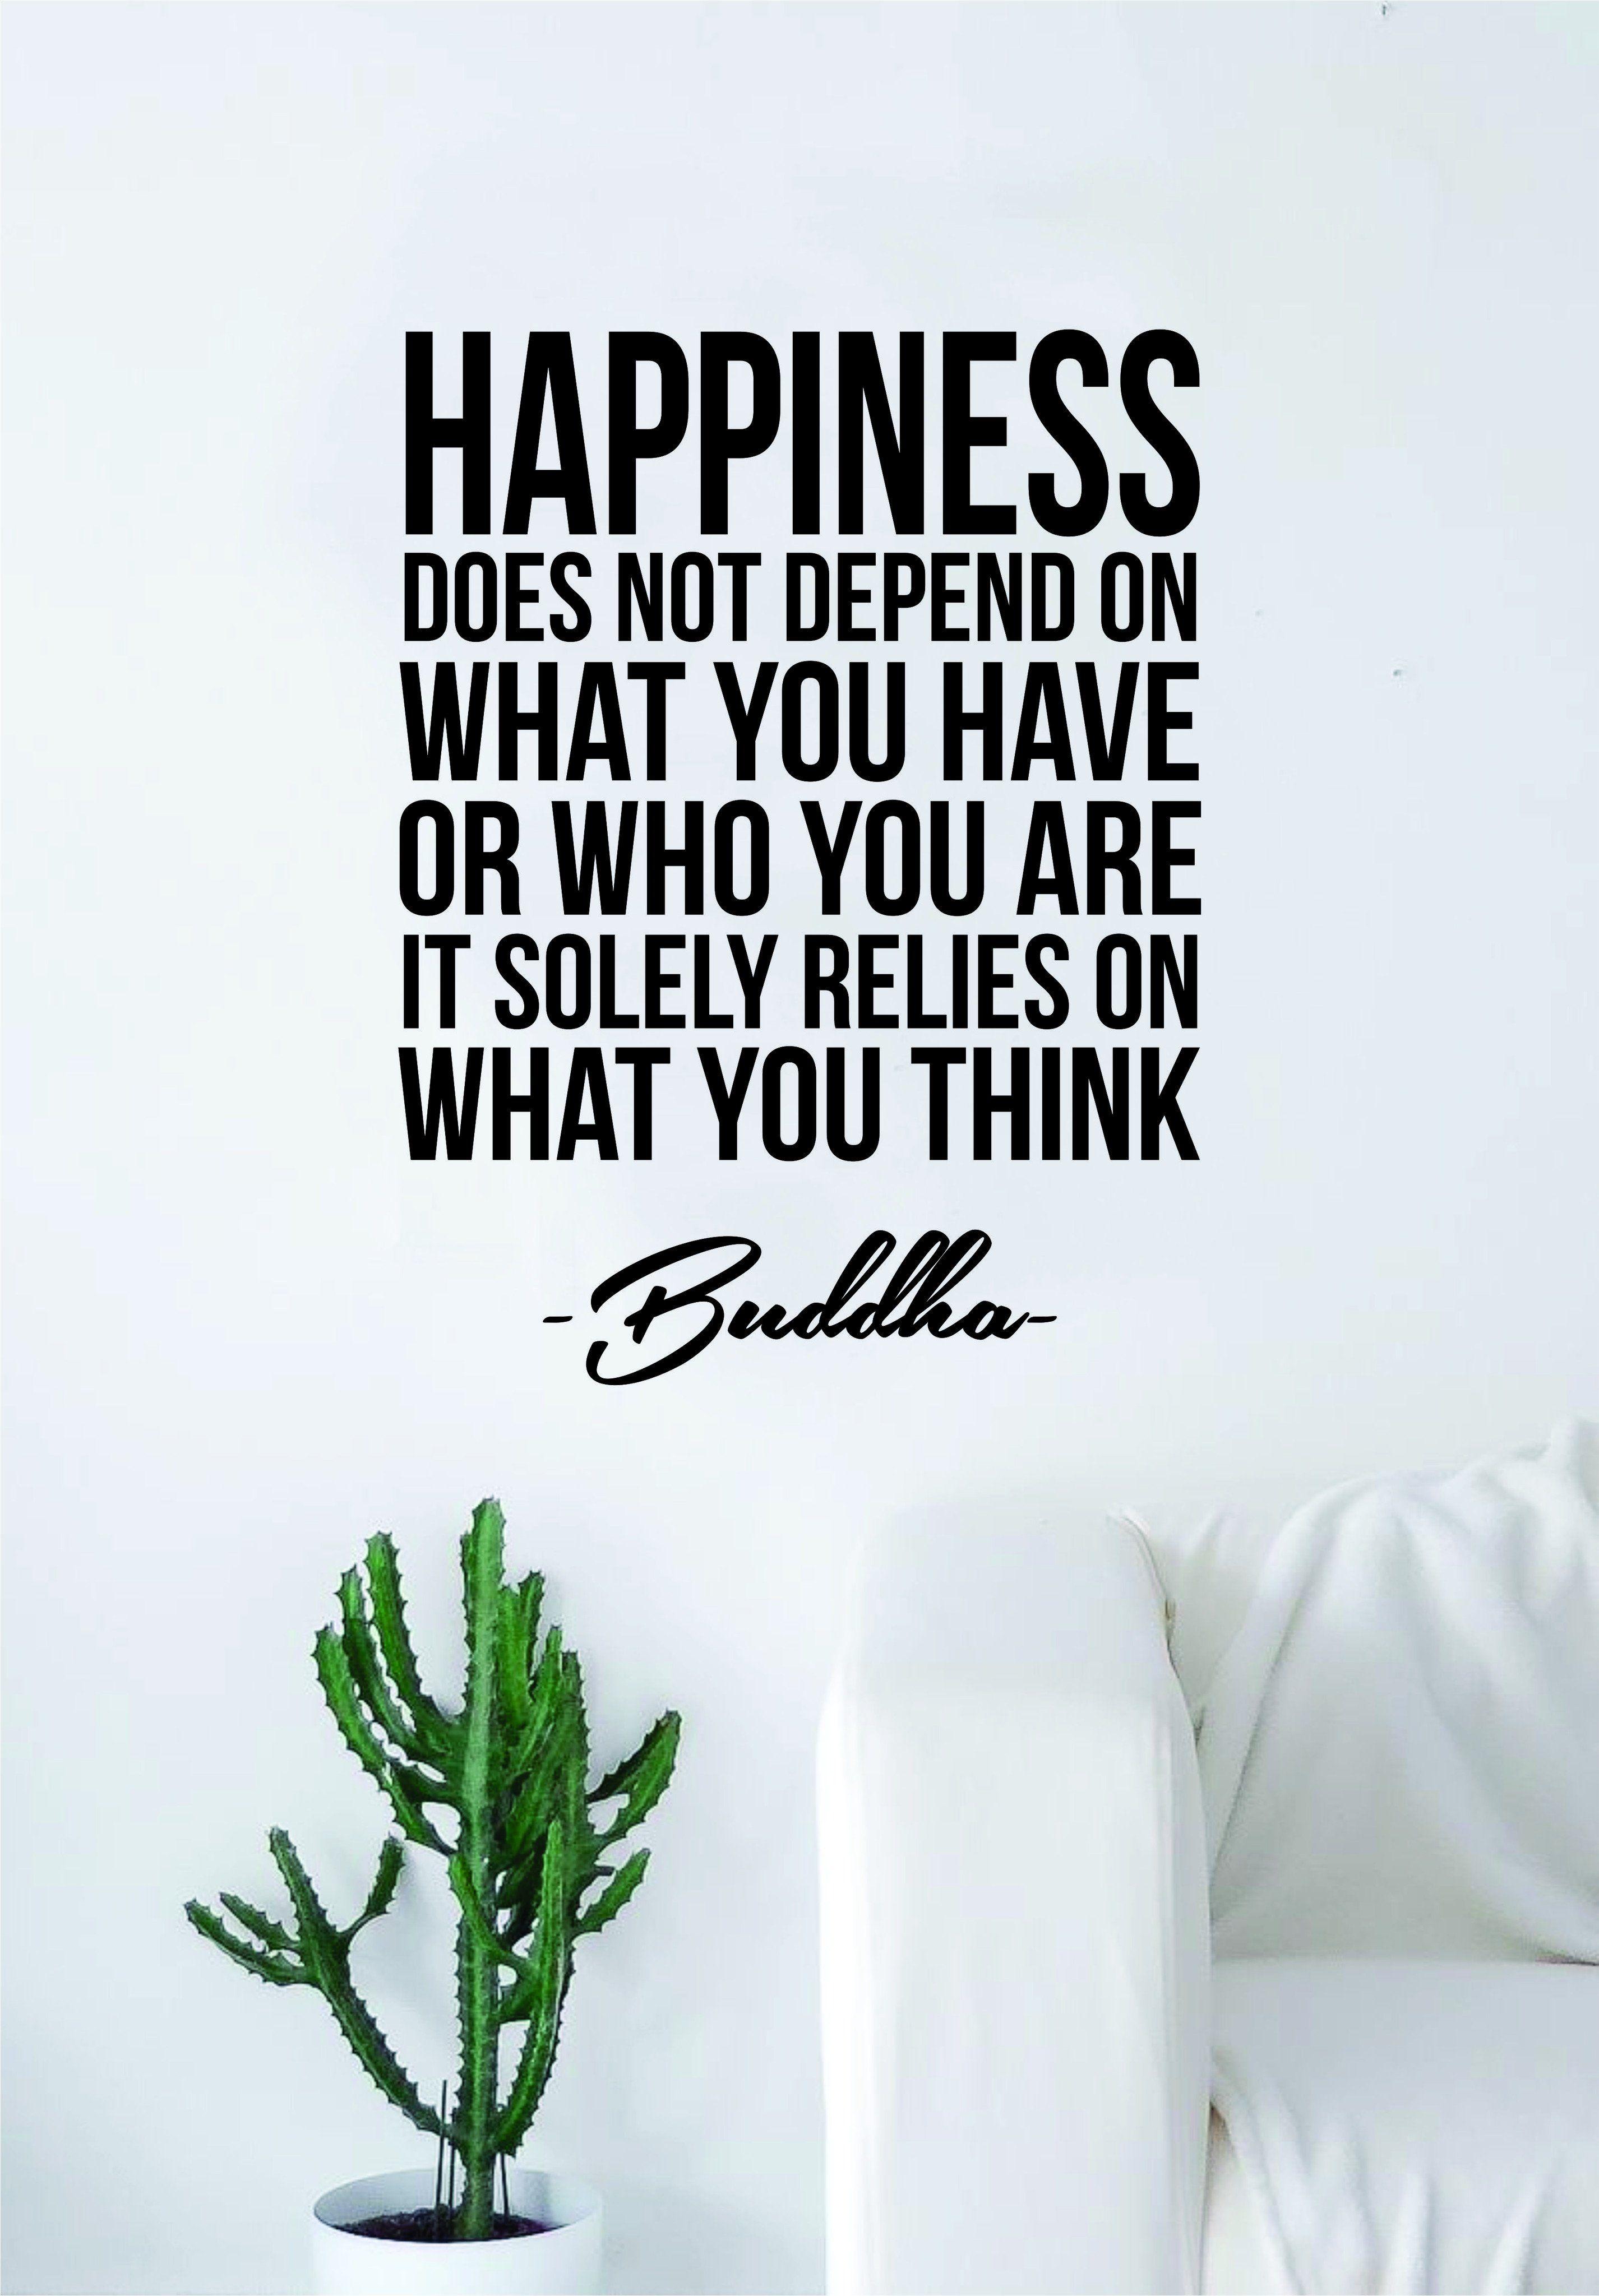 Buddha Happiness v2 Quote Wall Decal Sticker Vinyl Art Living Room Bedroom Decor Yoga Meditate Zen Inspirational - black